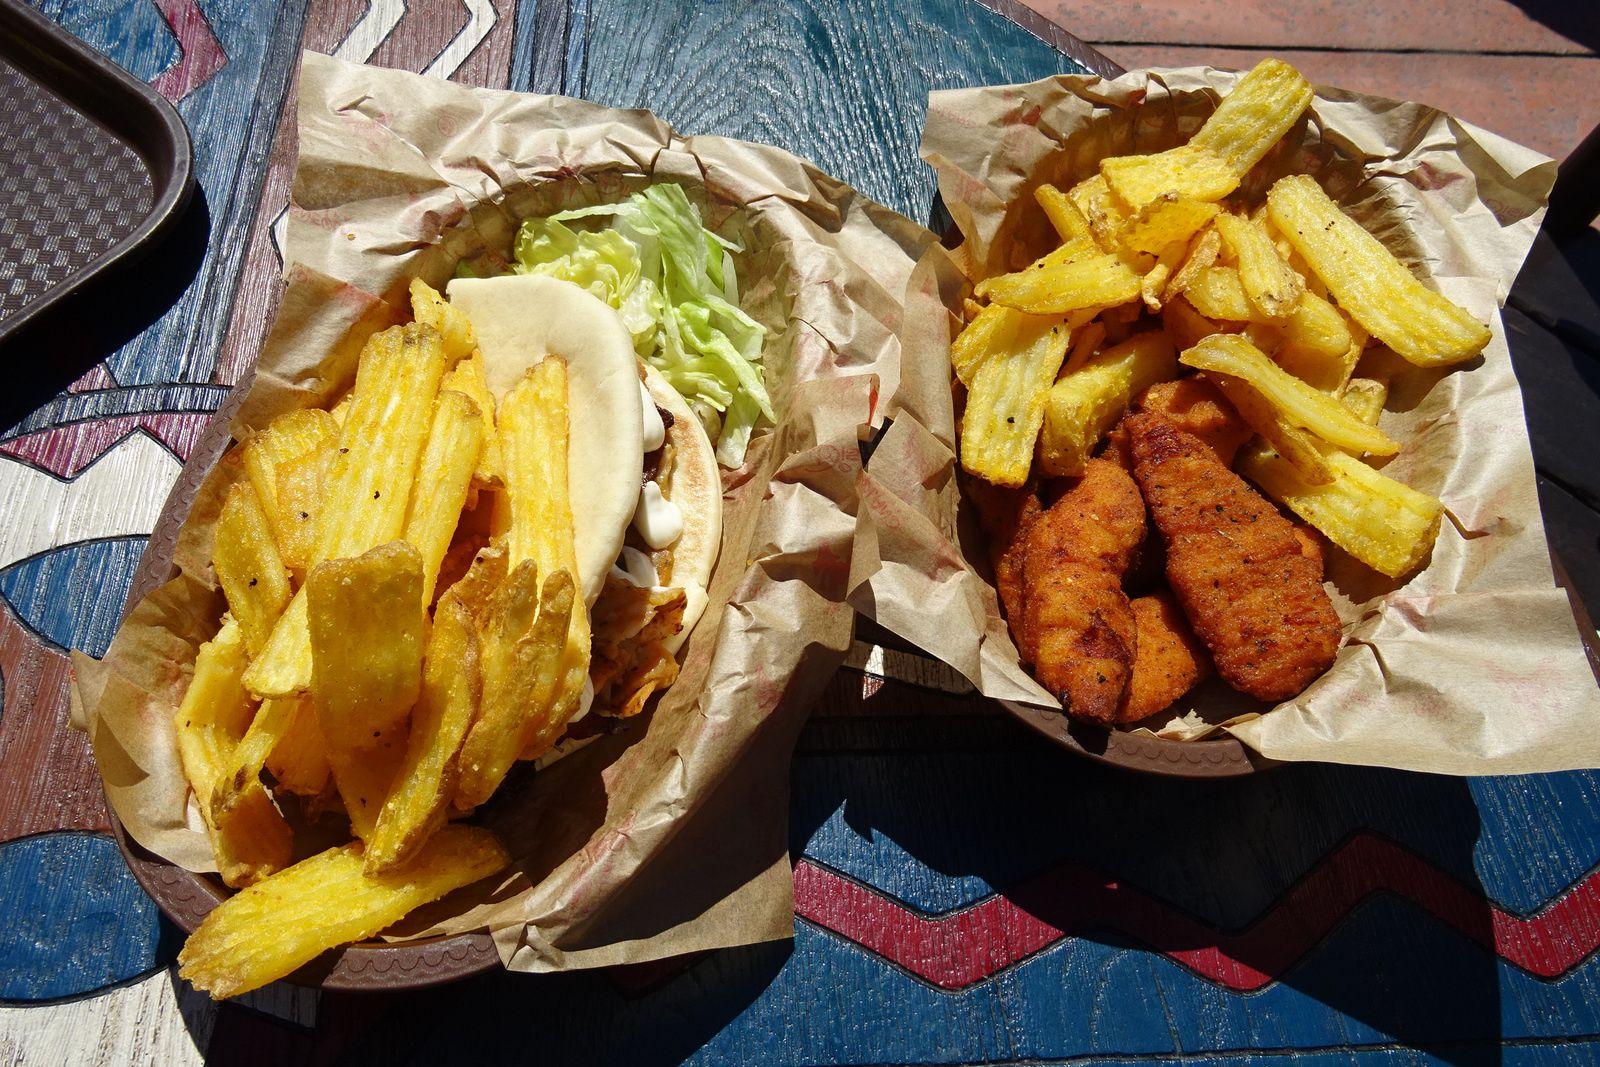 Les restaurants d'Adventureland à Disneyland Paris